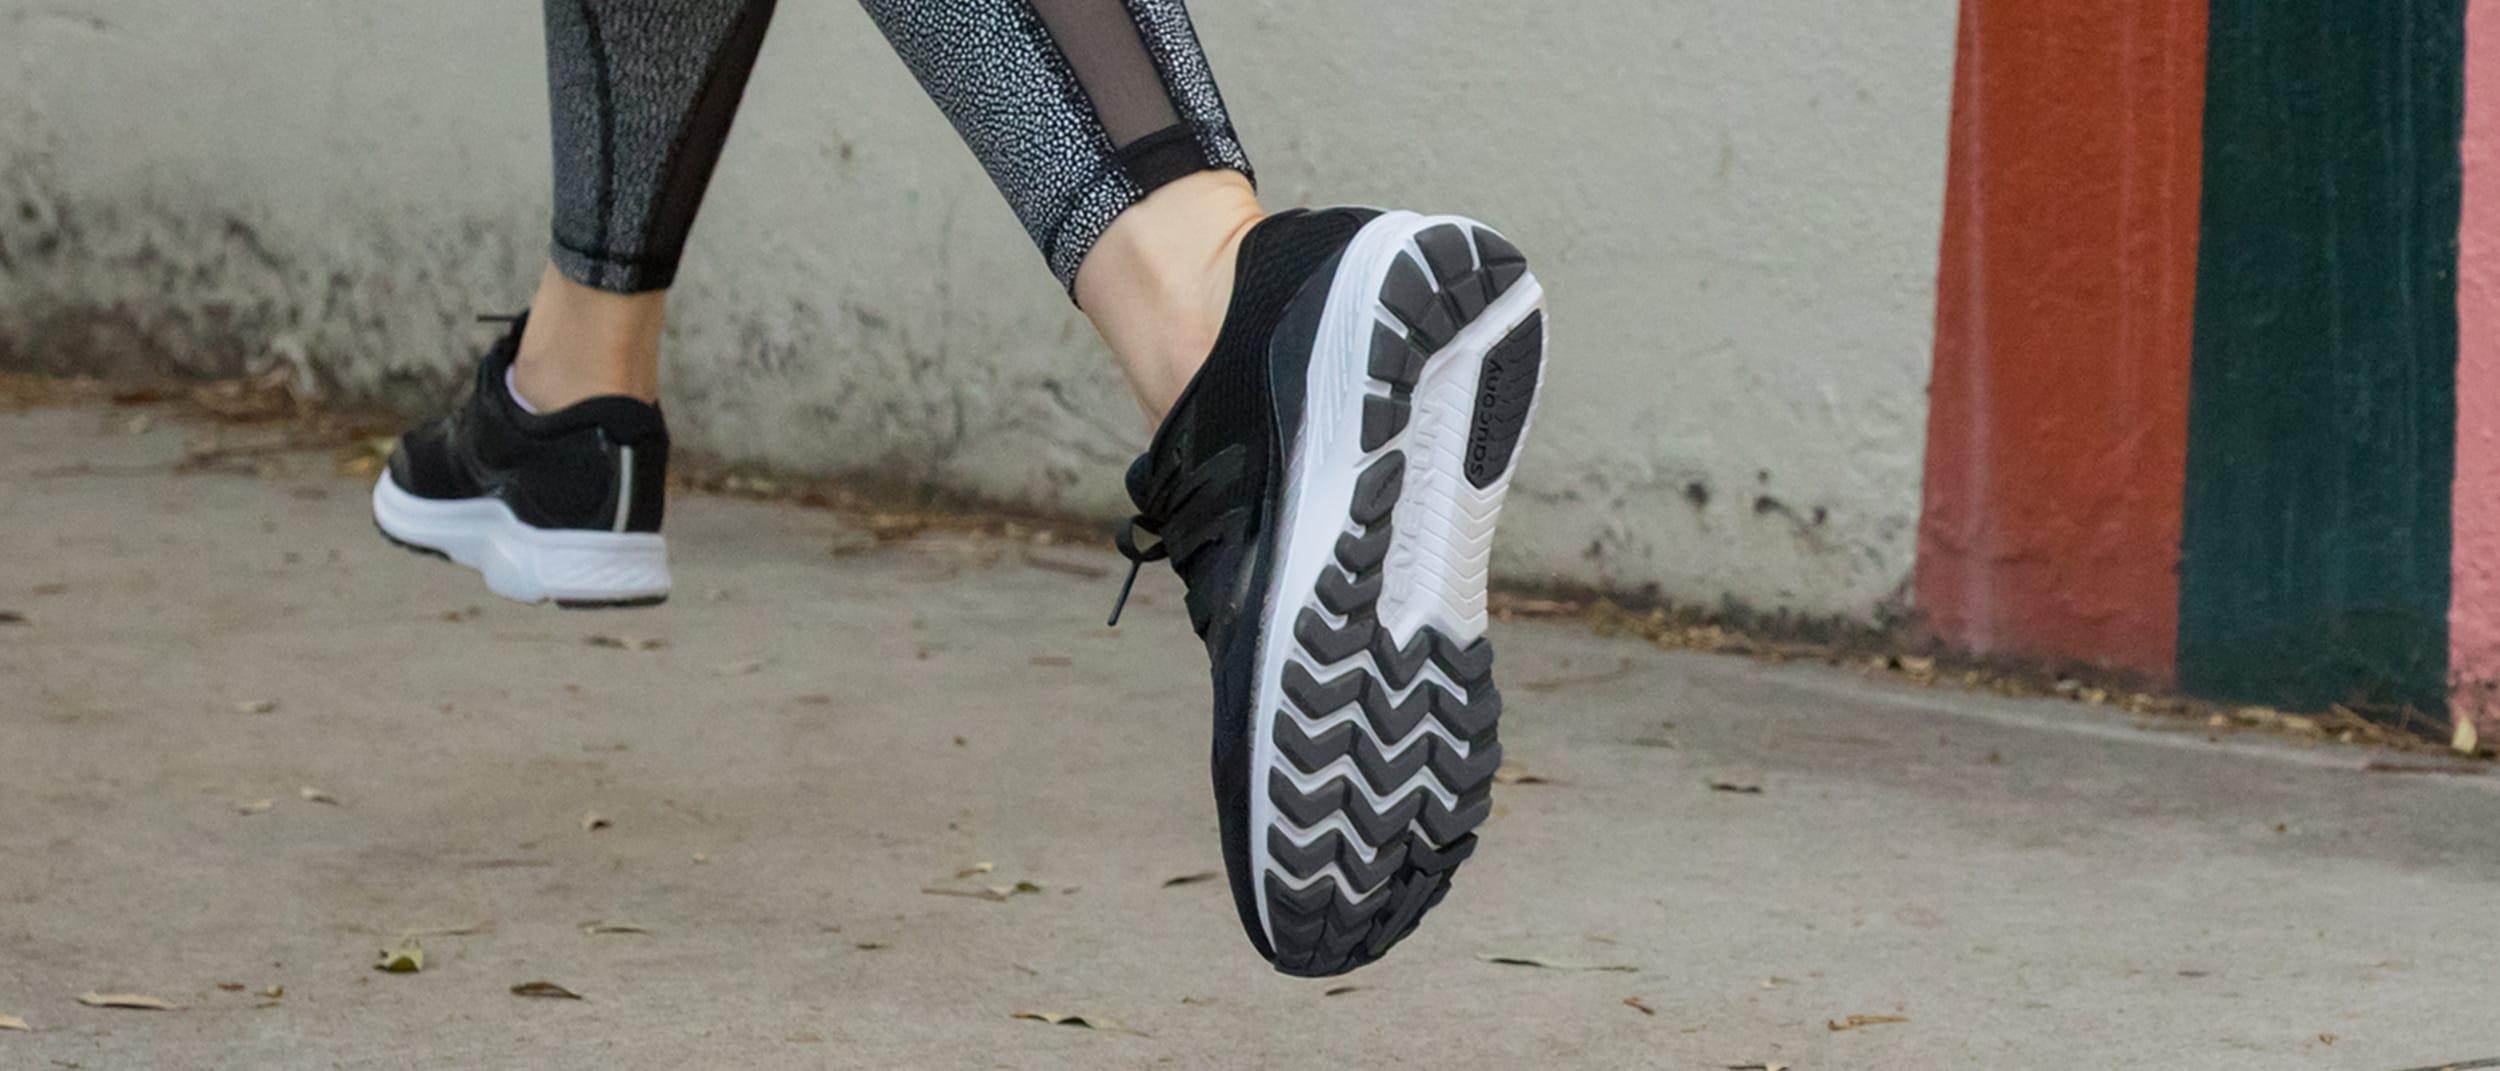 Athlete's Foot: Saucony exclusive pre-release